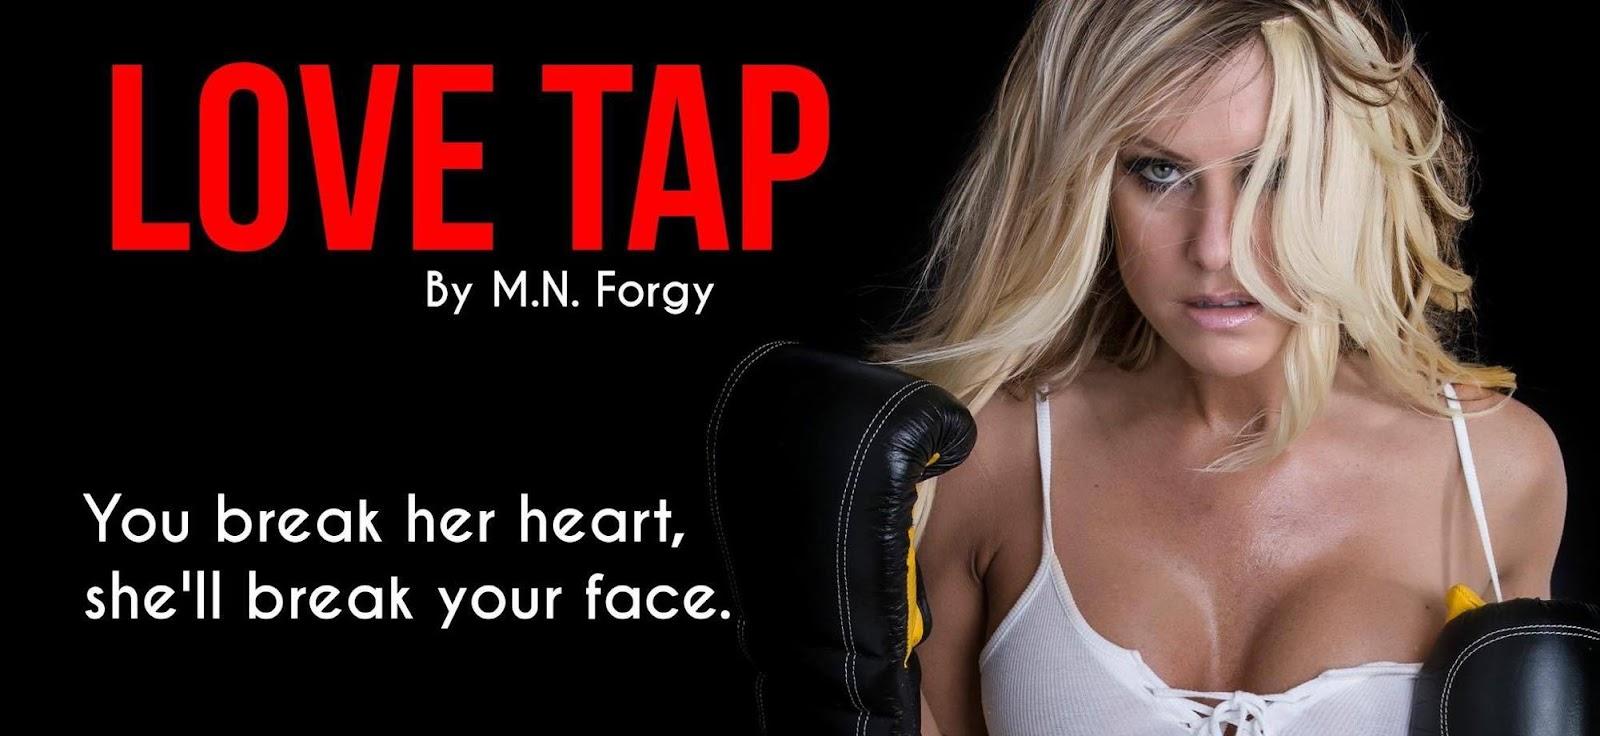 Love Tap Teaster.jpg